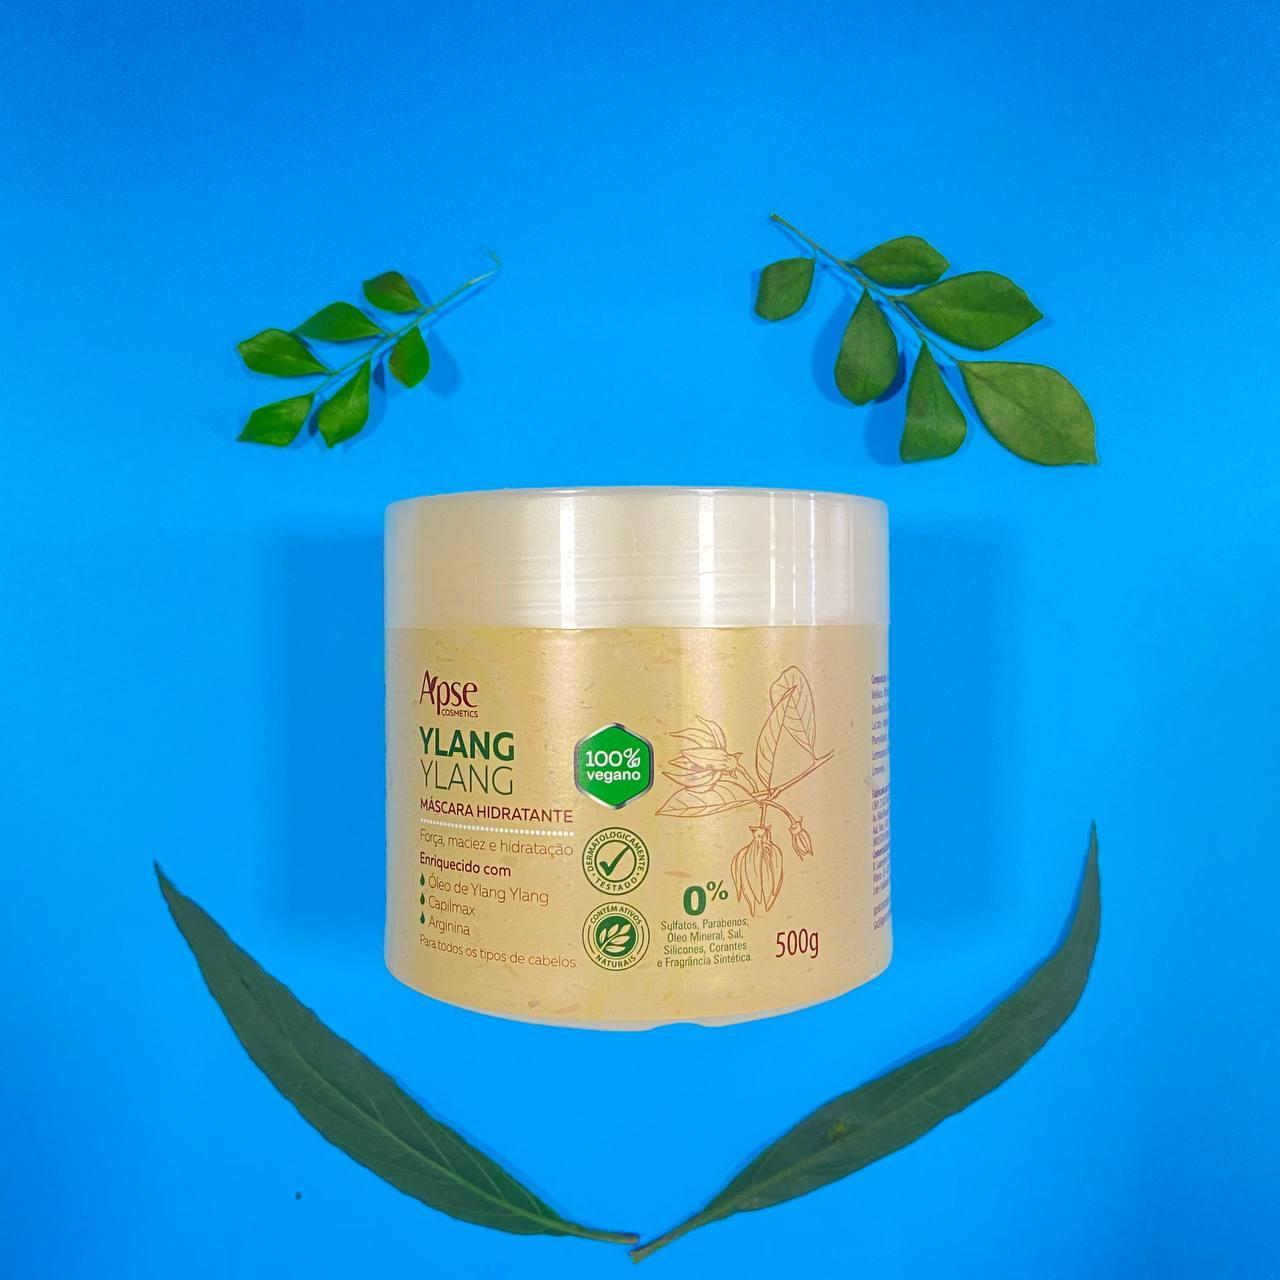 Máscara Hidratante Ylang Ylang - Apse Cosmetics 500g